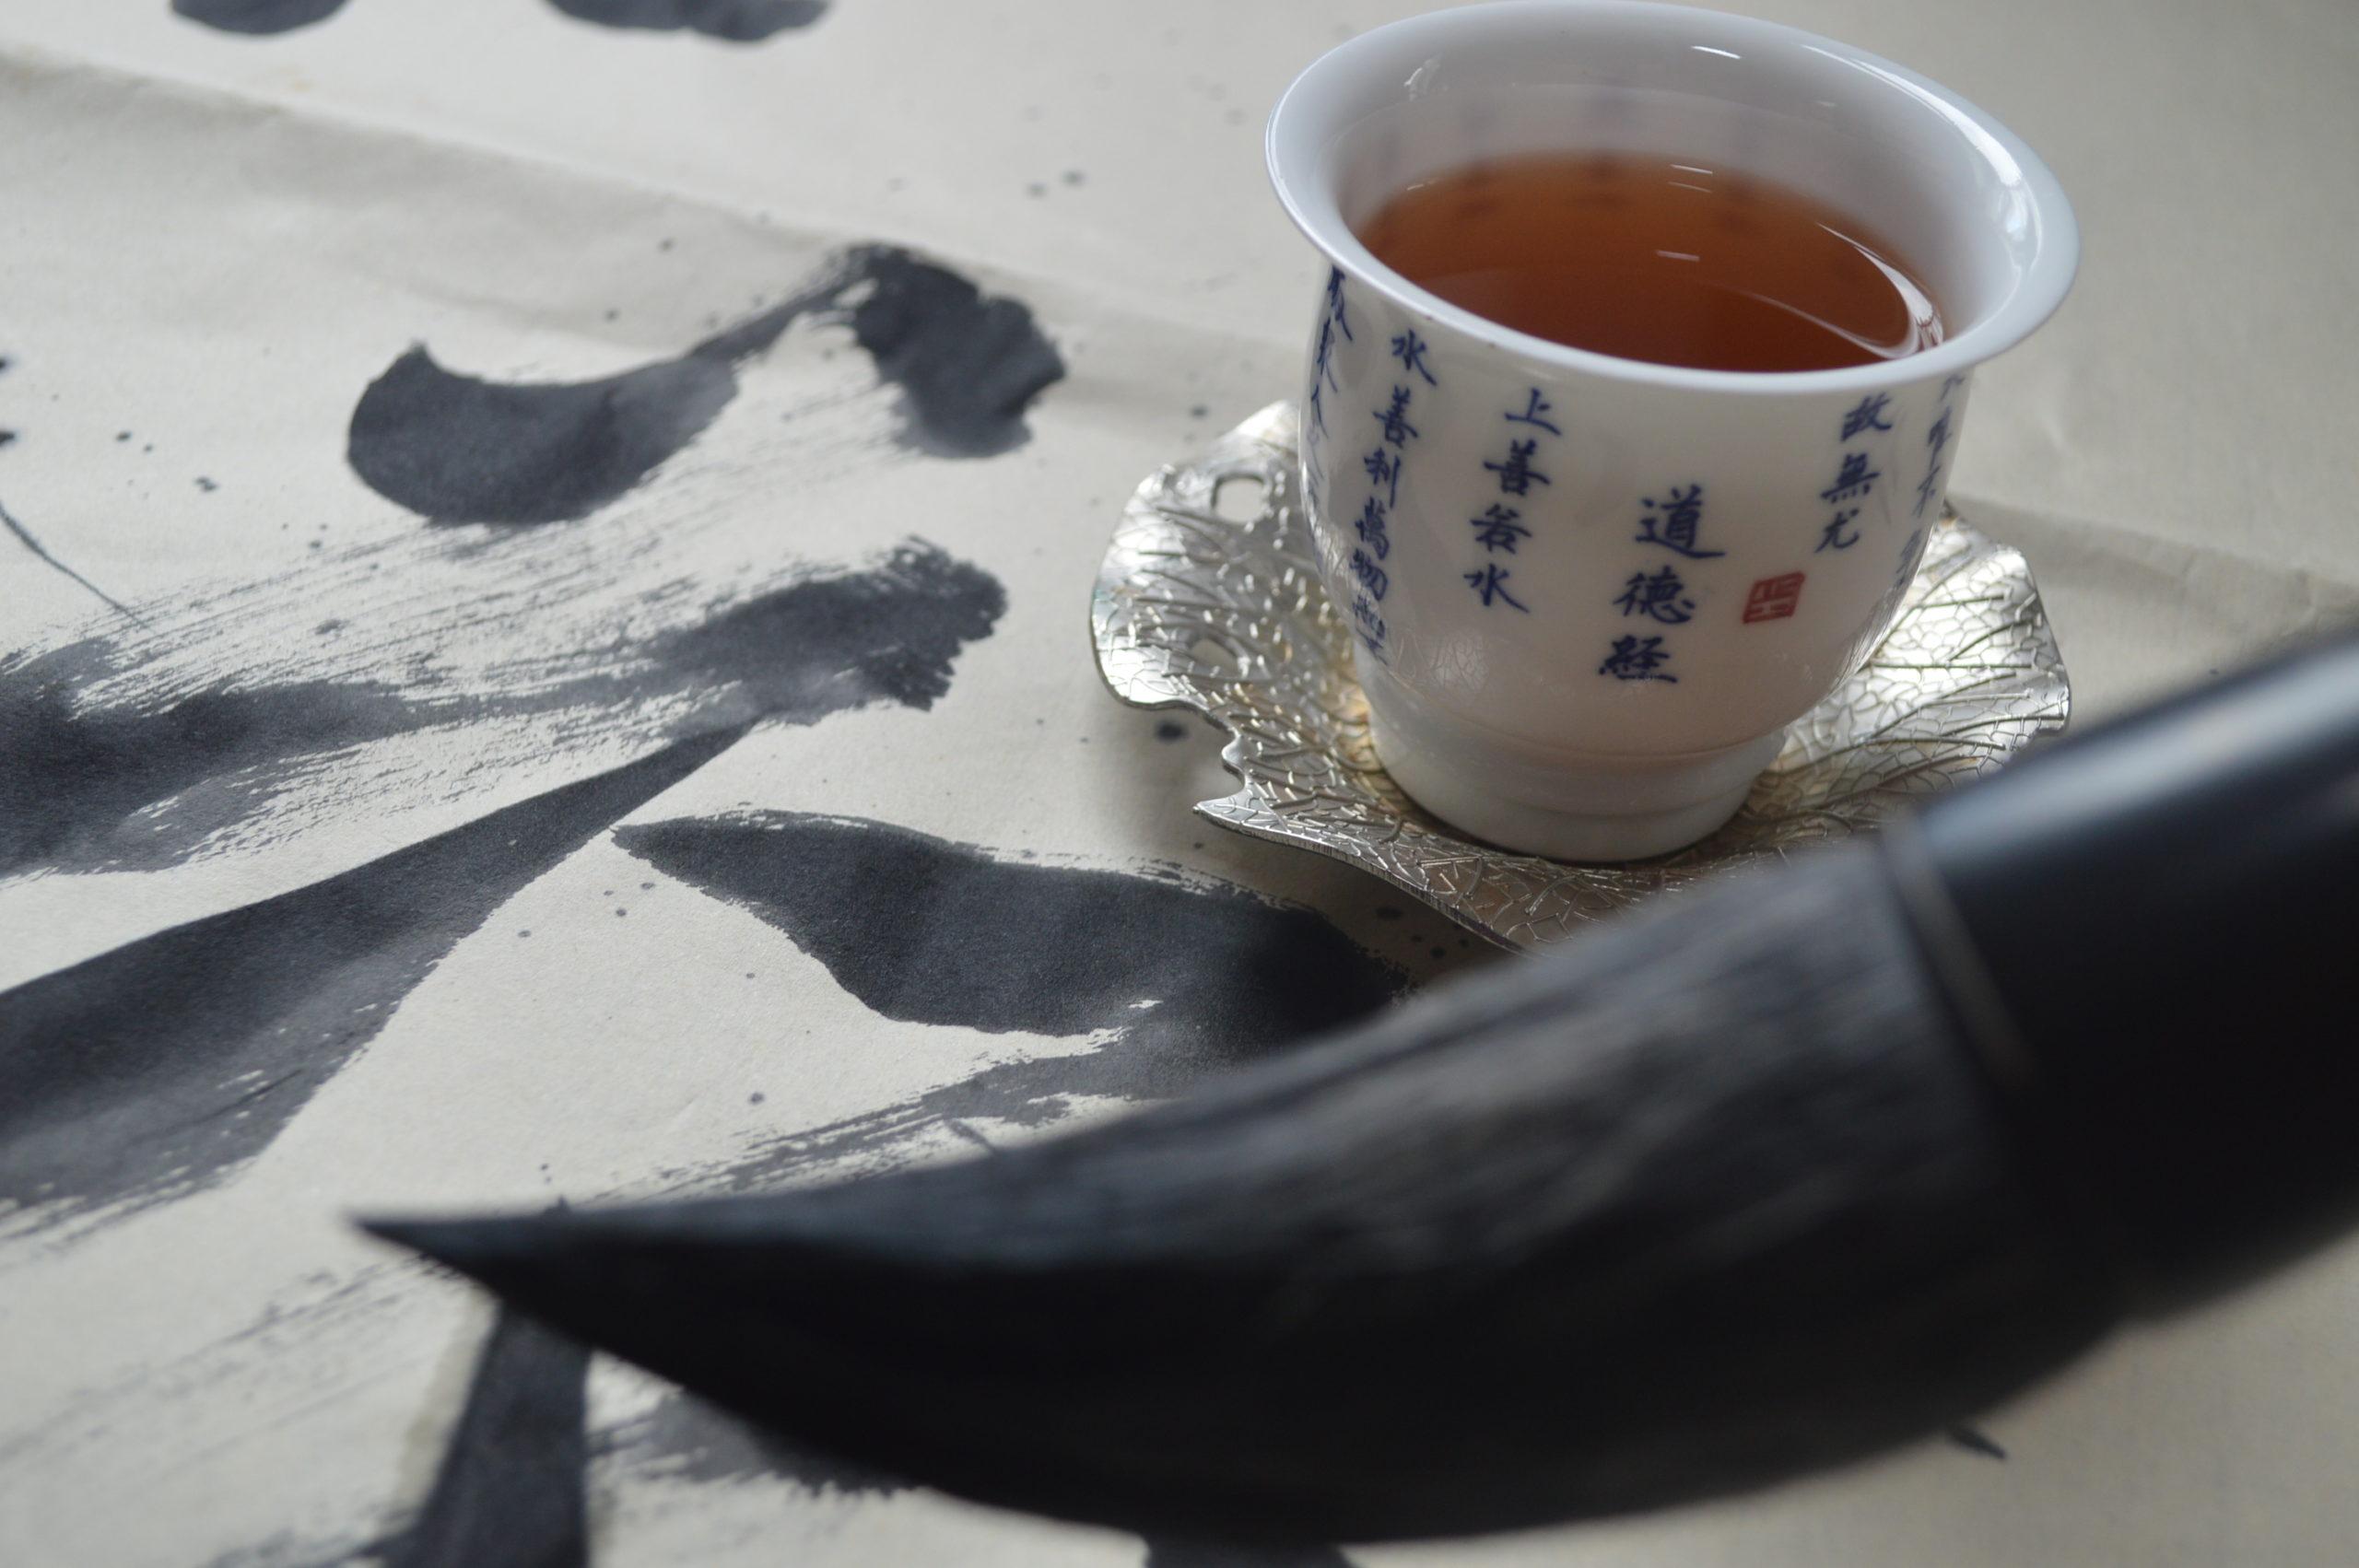 https://shop.liu-tea-art.com/wp-content/uploads/2017/06/DSC_0226-scaled.jpg